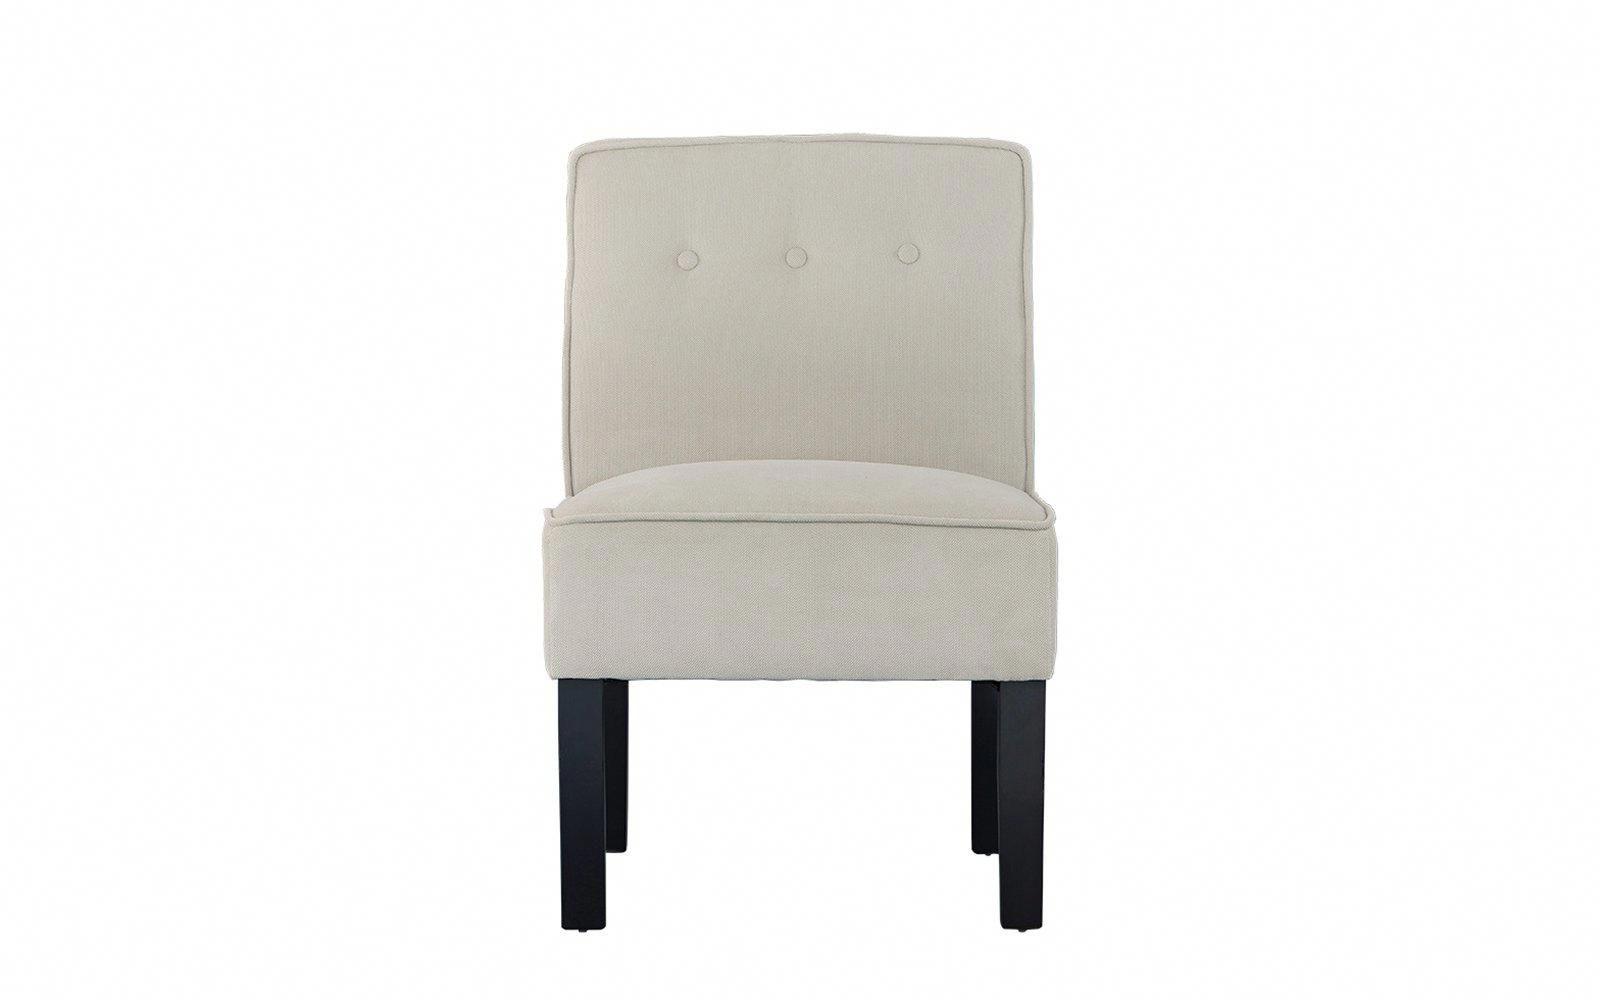 Ames Classic Armless Linen Accent Chair #ameschair (View 14 of 20)